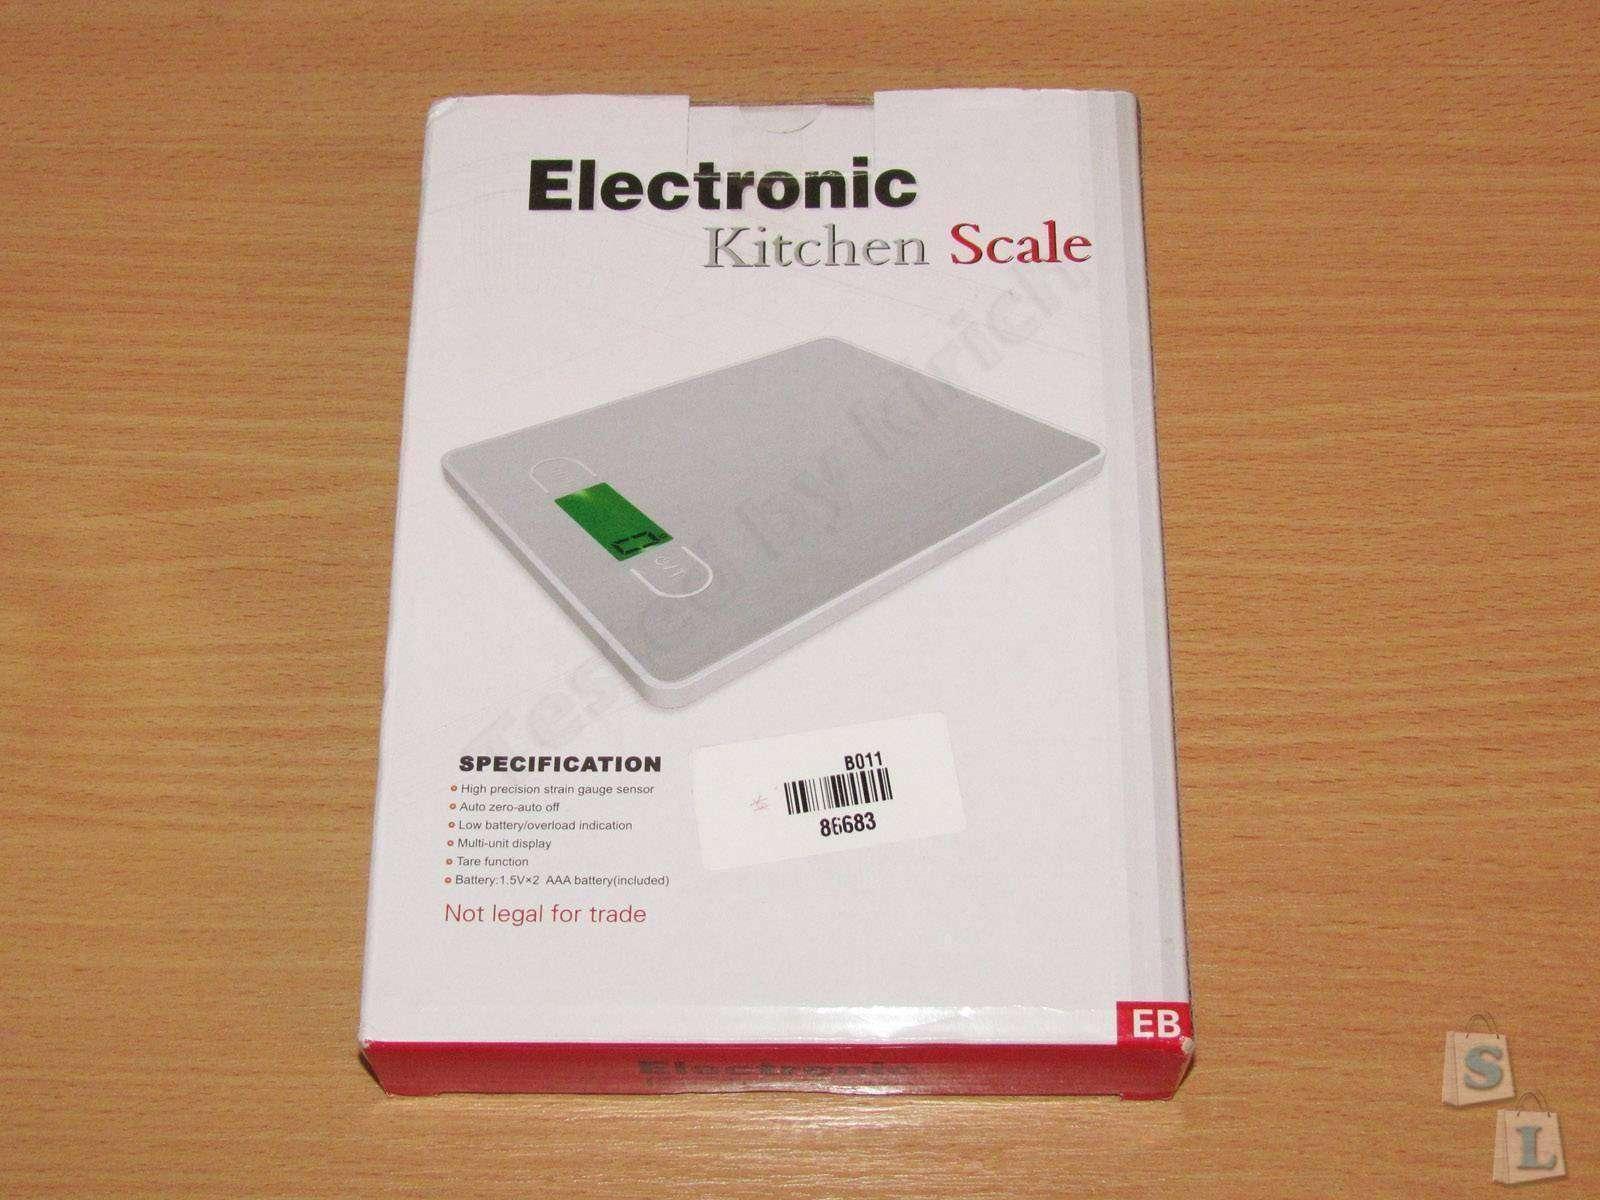 ChinaBuye: Еще одни кухонные электронные весы.